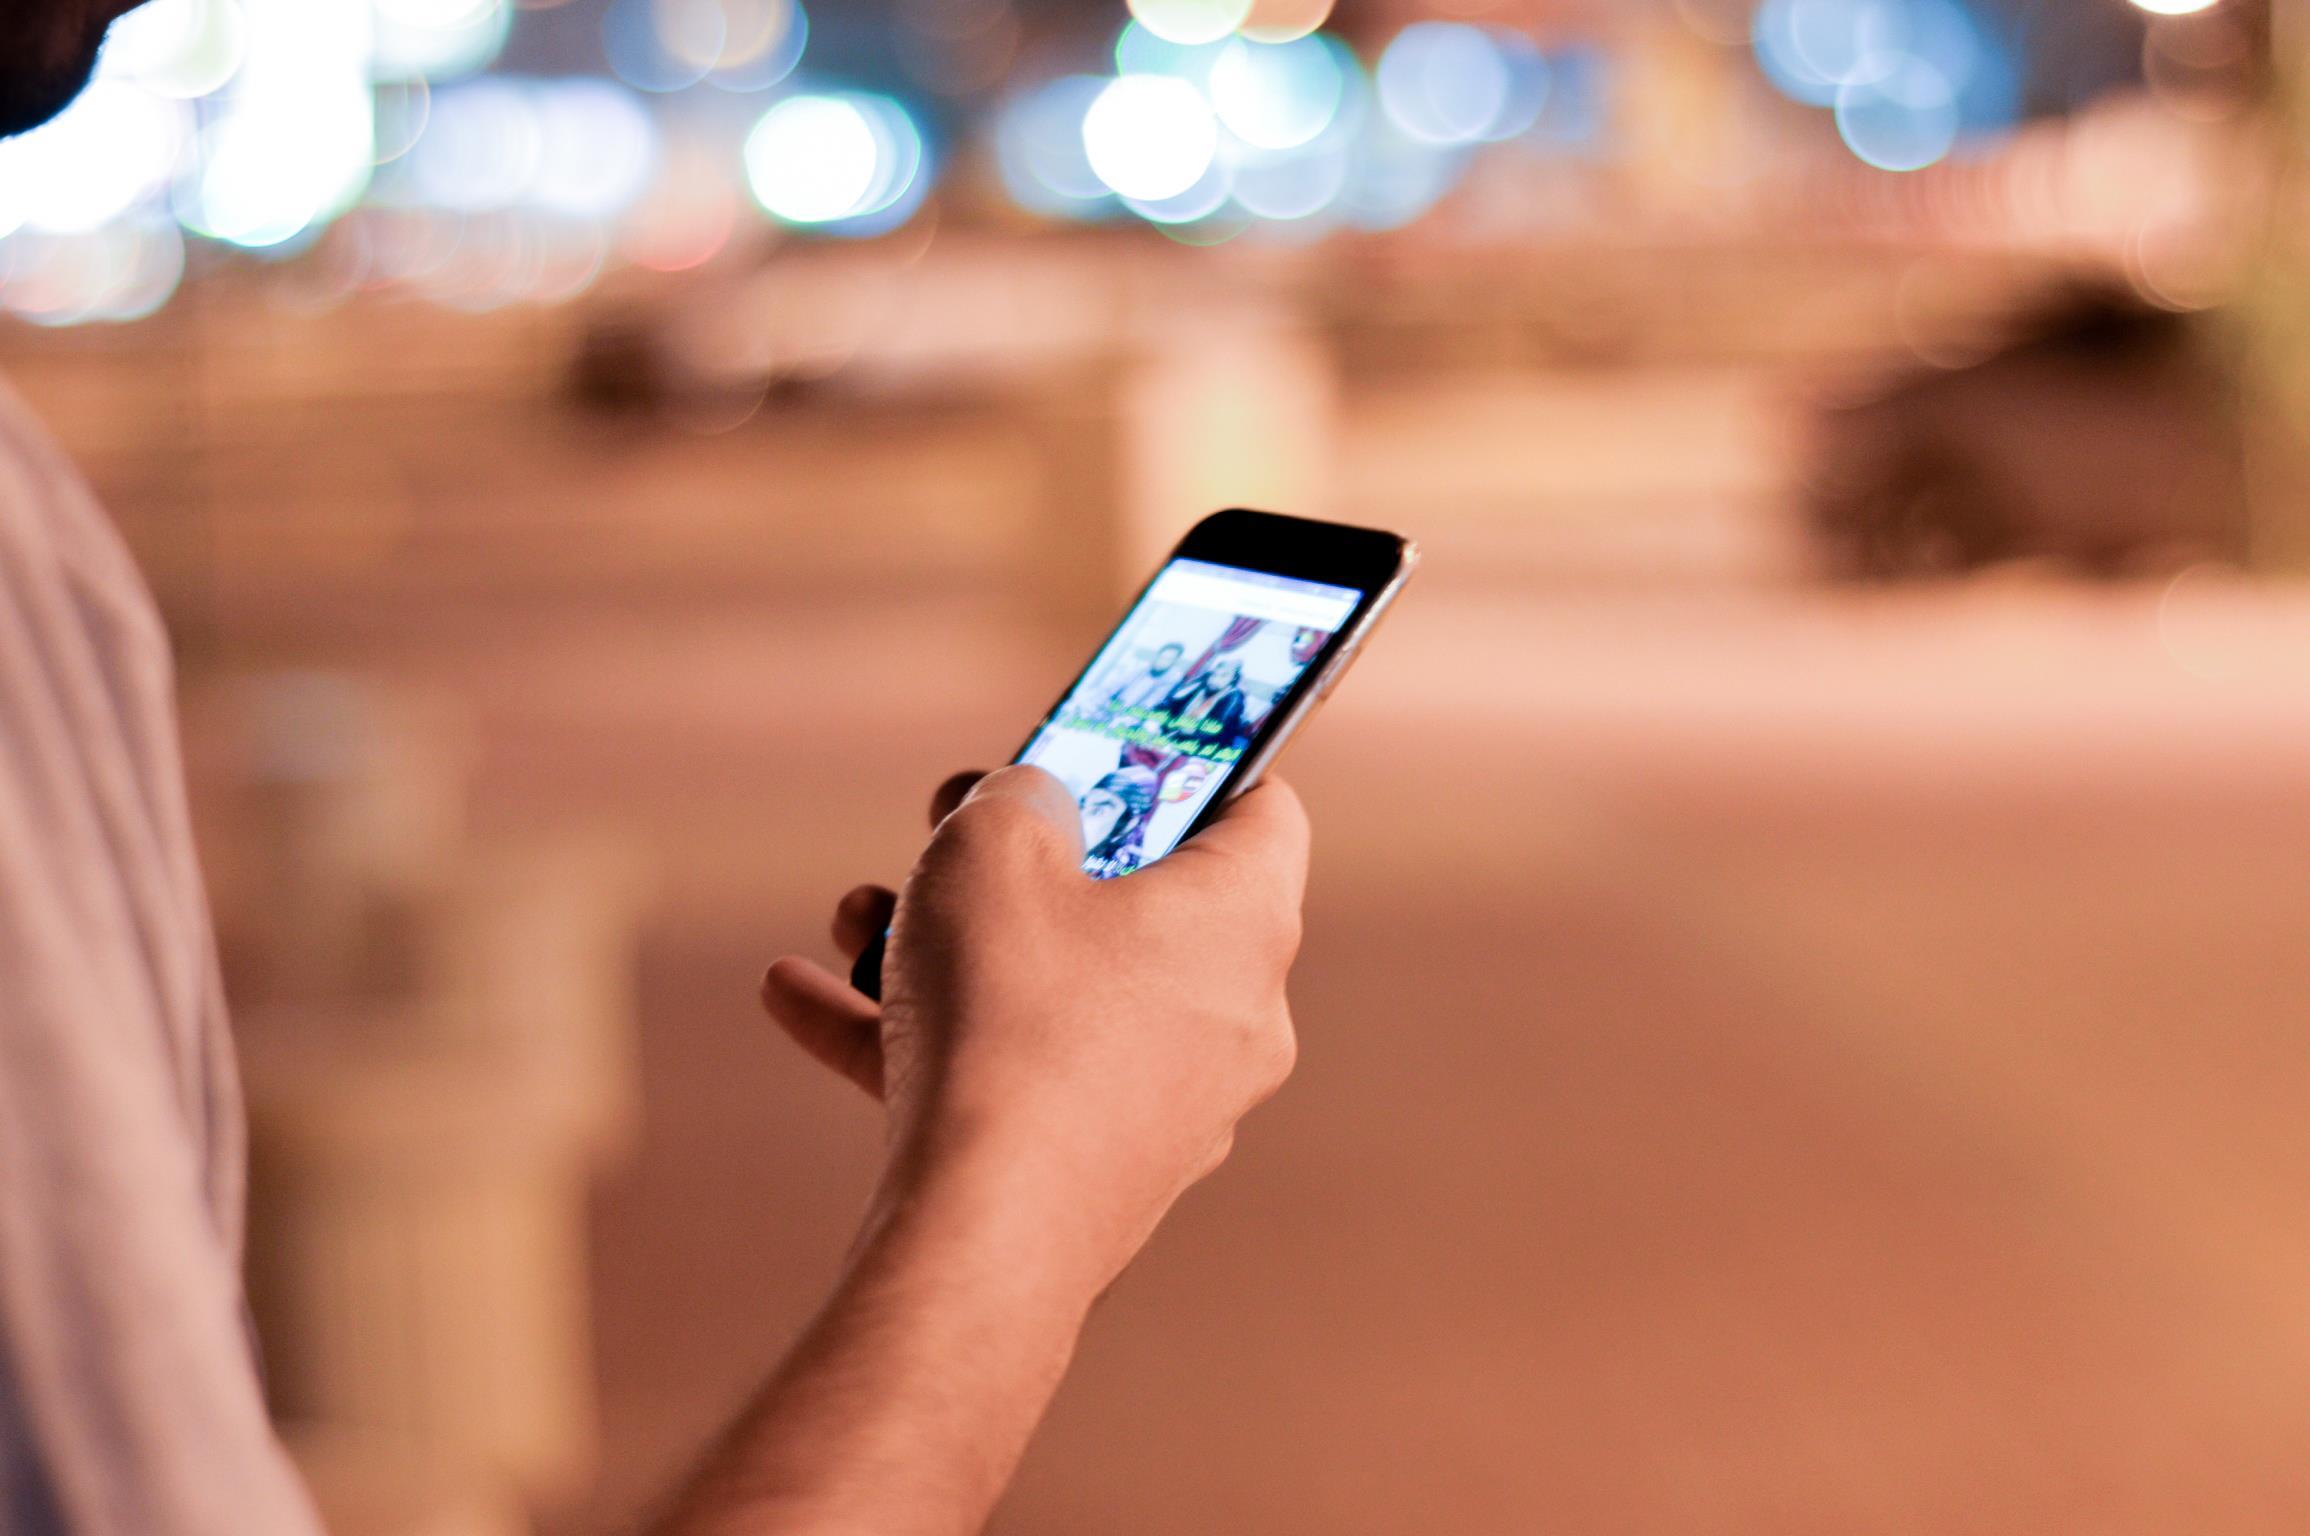 iPhone aplikacje randkowe Londyn40-latek ma 28 lat